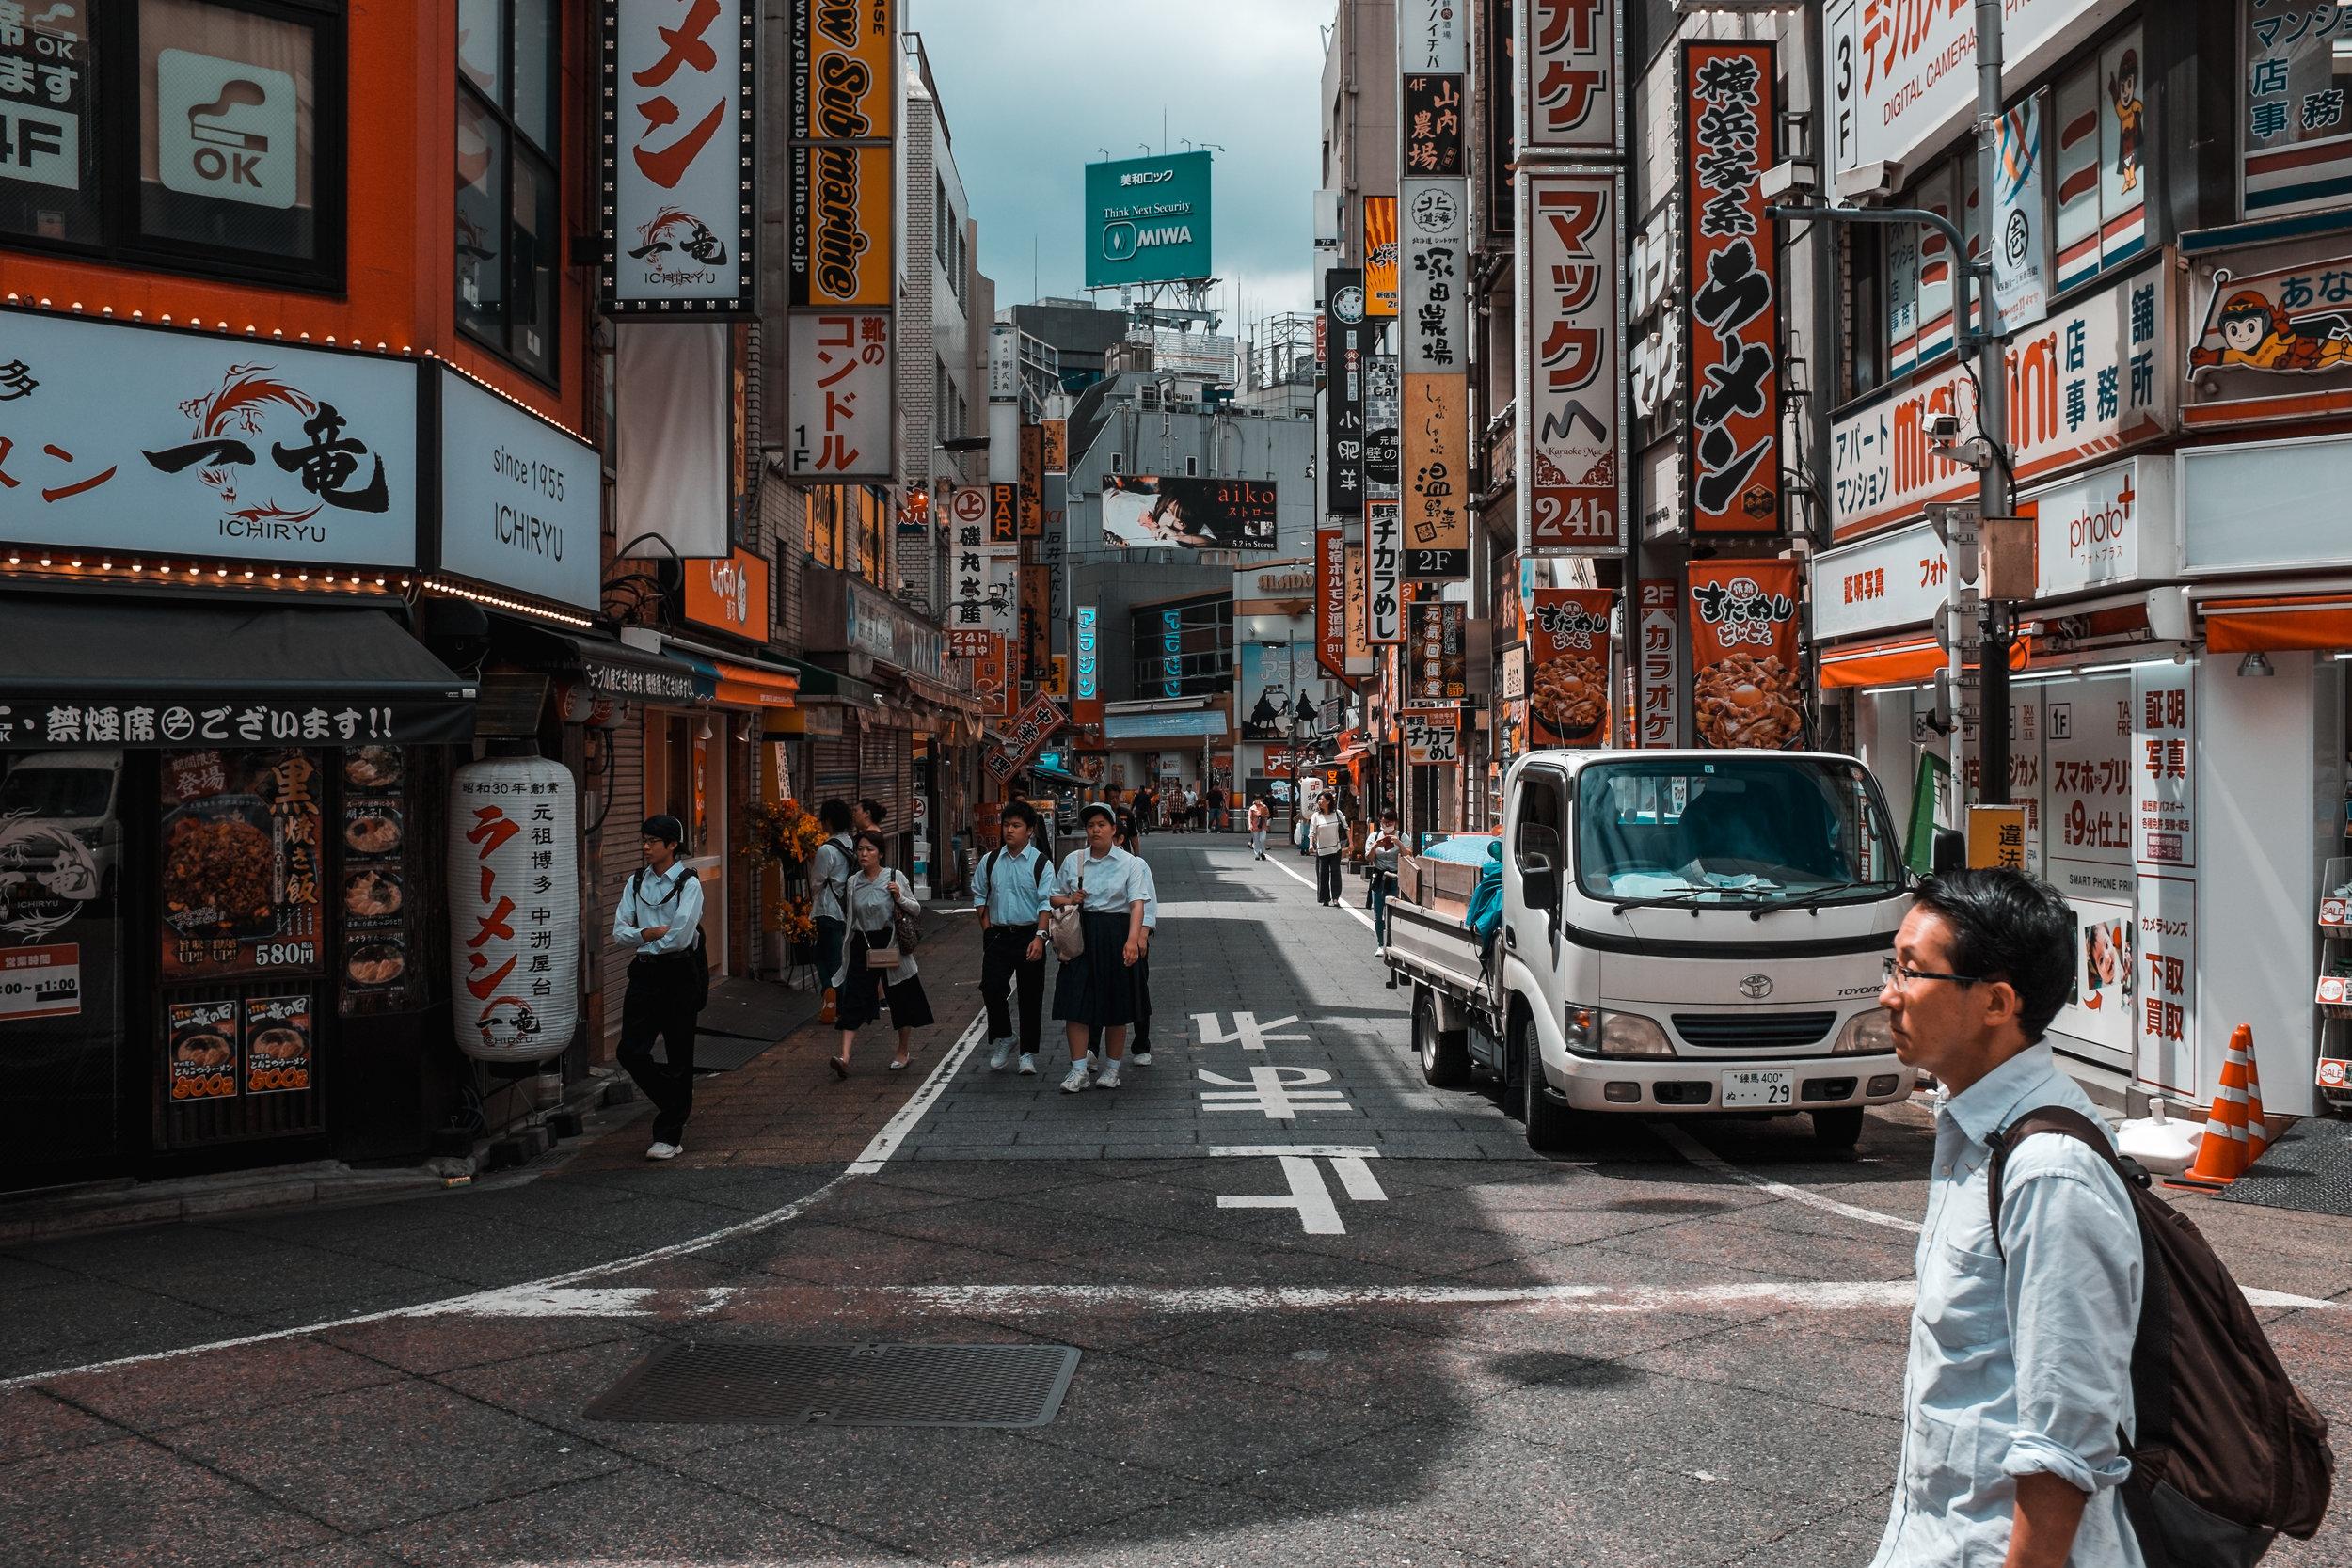 TokyoJapan_2018_AdamDillon_DSCF9095.jpg